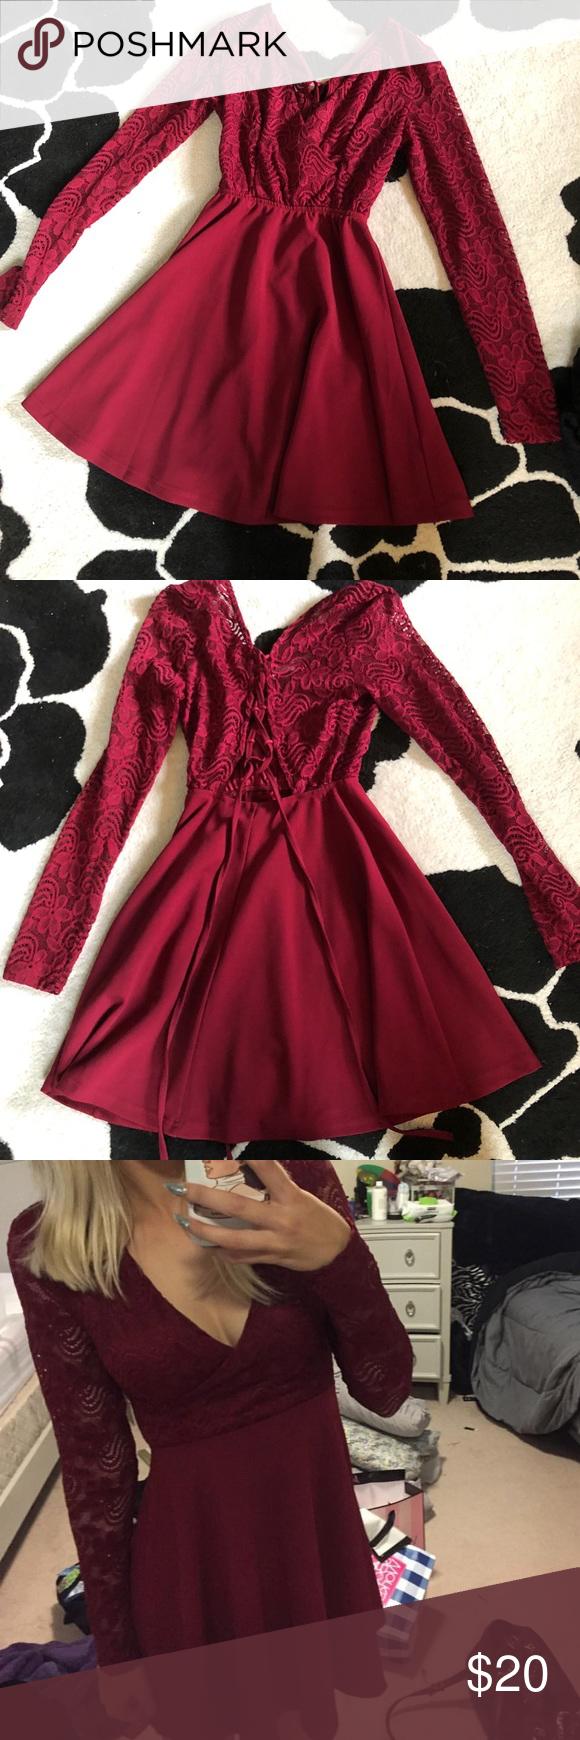 Windsor Burgundy Lace Long Sleeve Skater Dress Long Sleeve Skater Dress Dresses Long Sleeve Lace [ 1740 x 580 Pixel ]